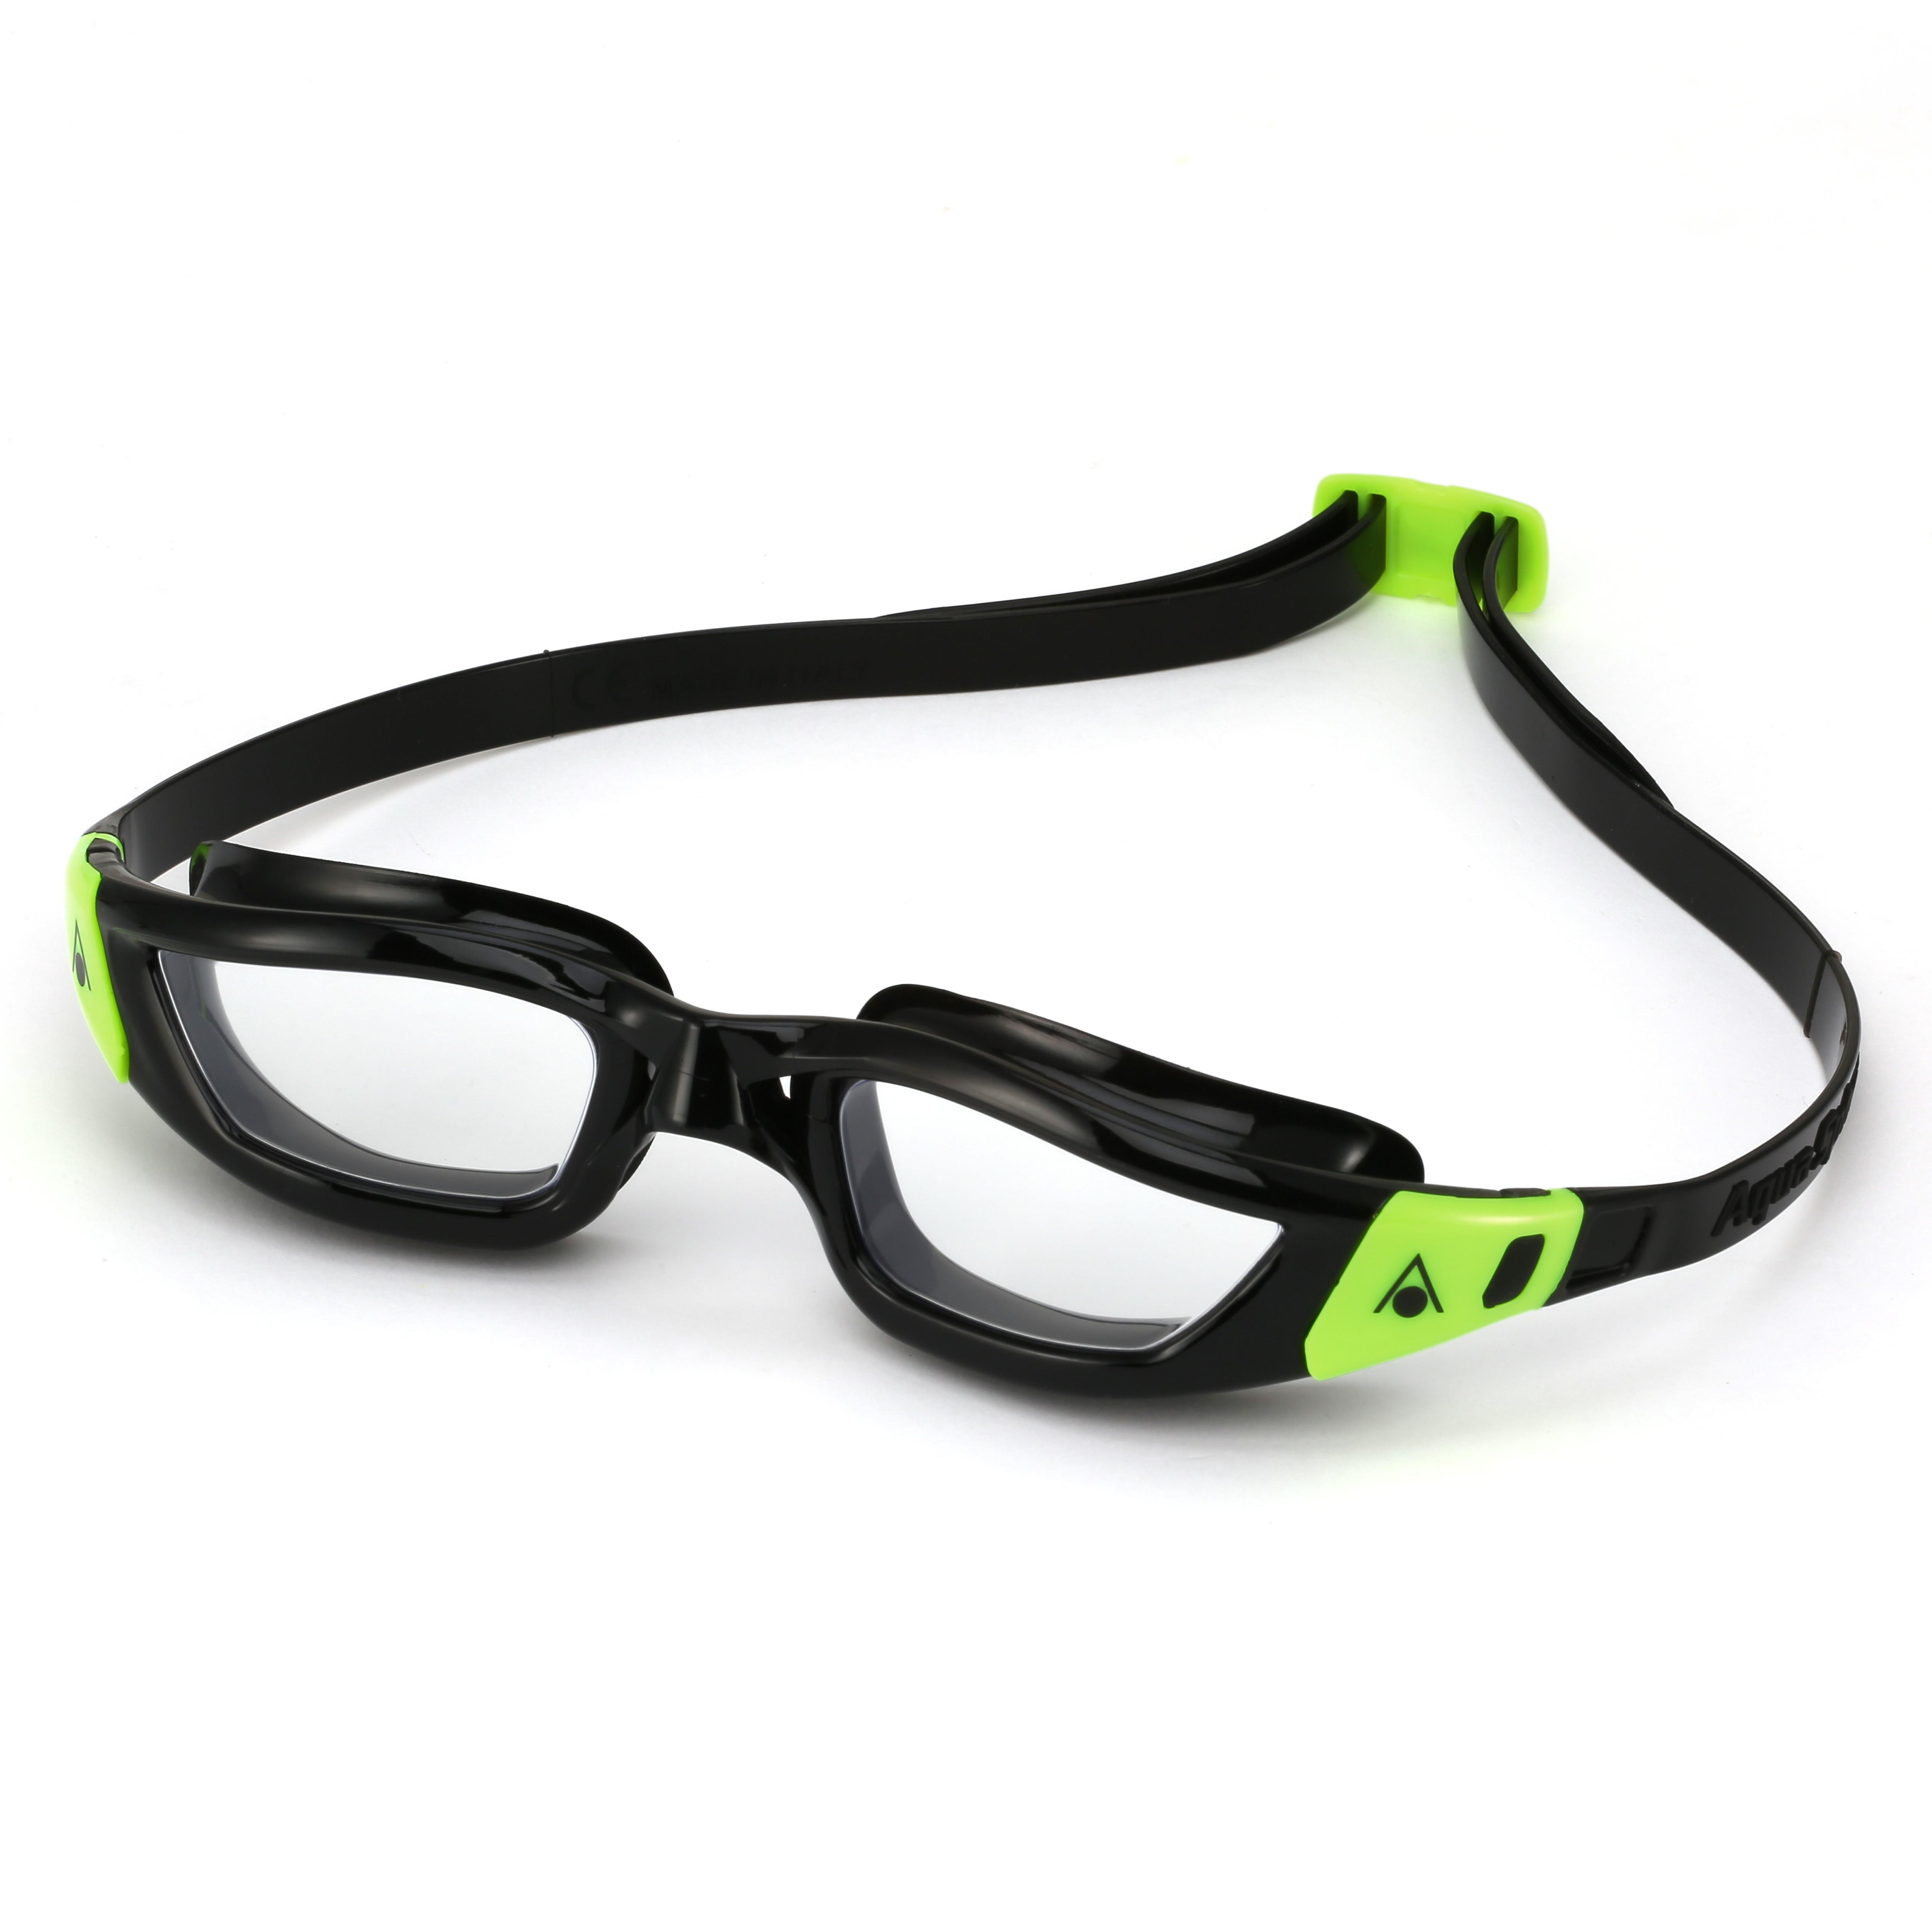 Image of Aqua Sphere Kameleon Swimming Goggles - Black/Green, Clear